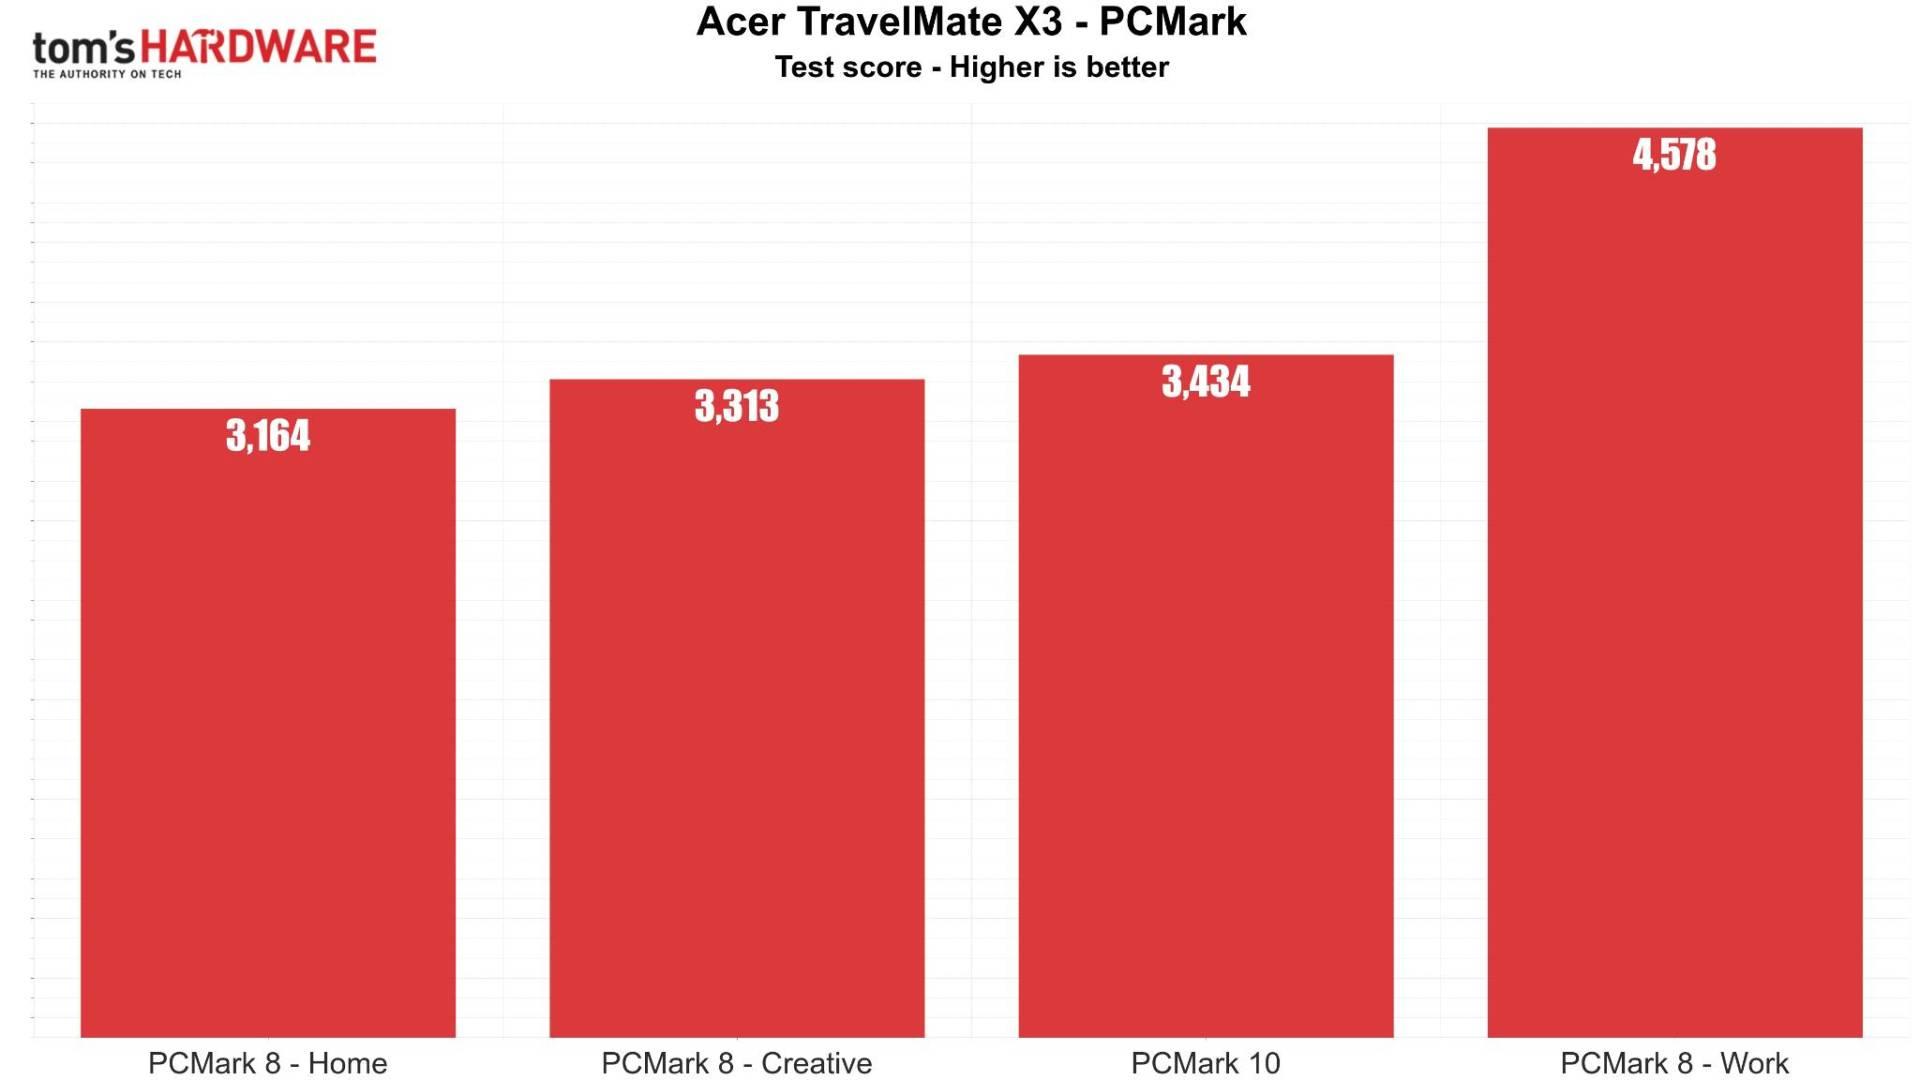 Acer TravelMate X3 PCMark